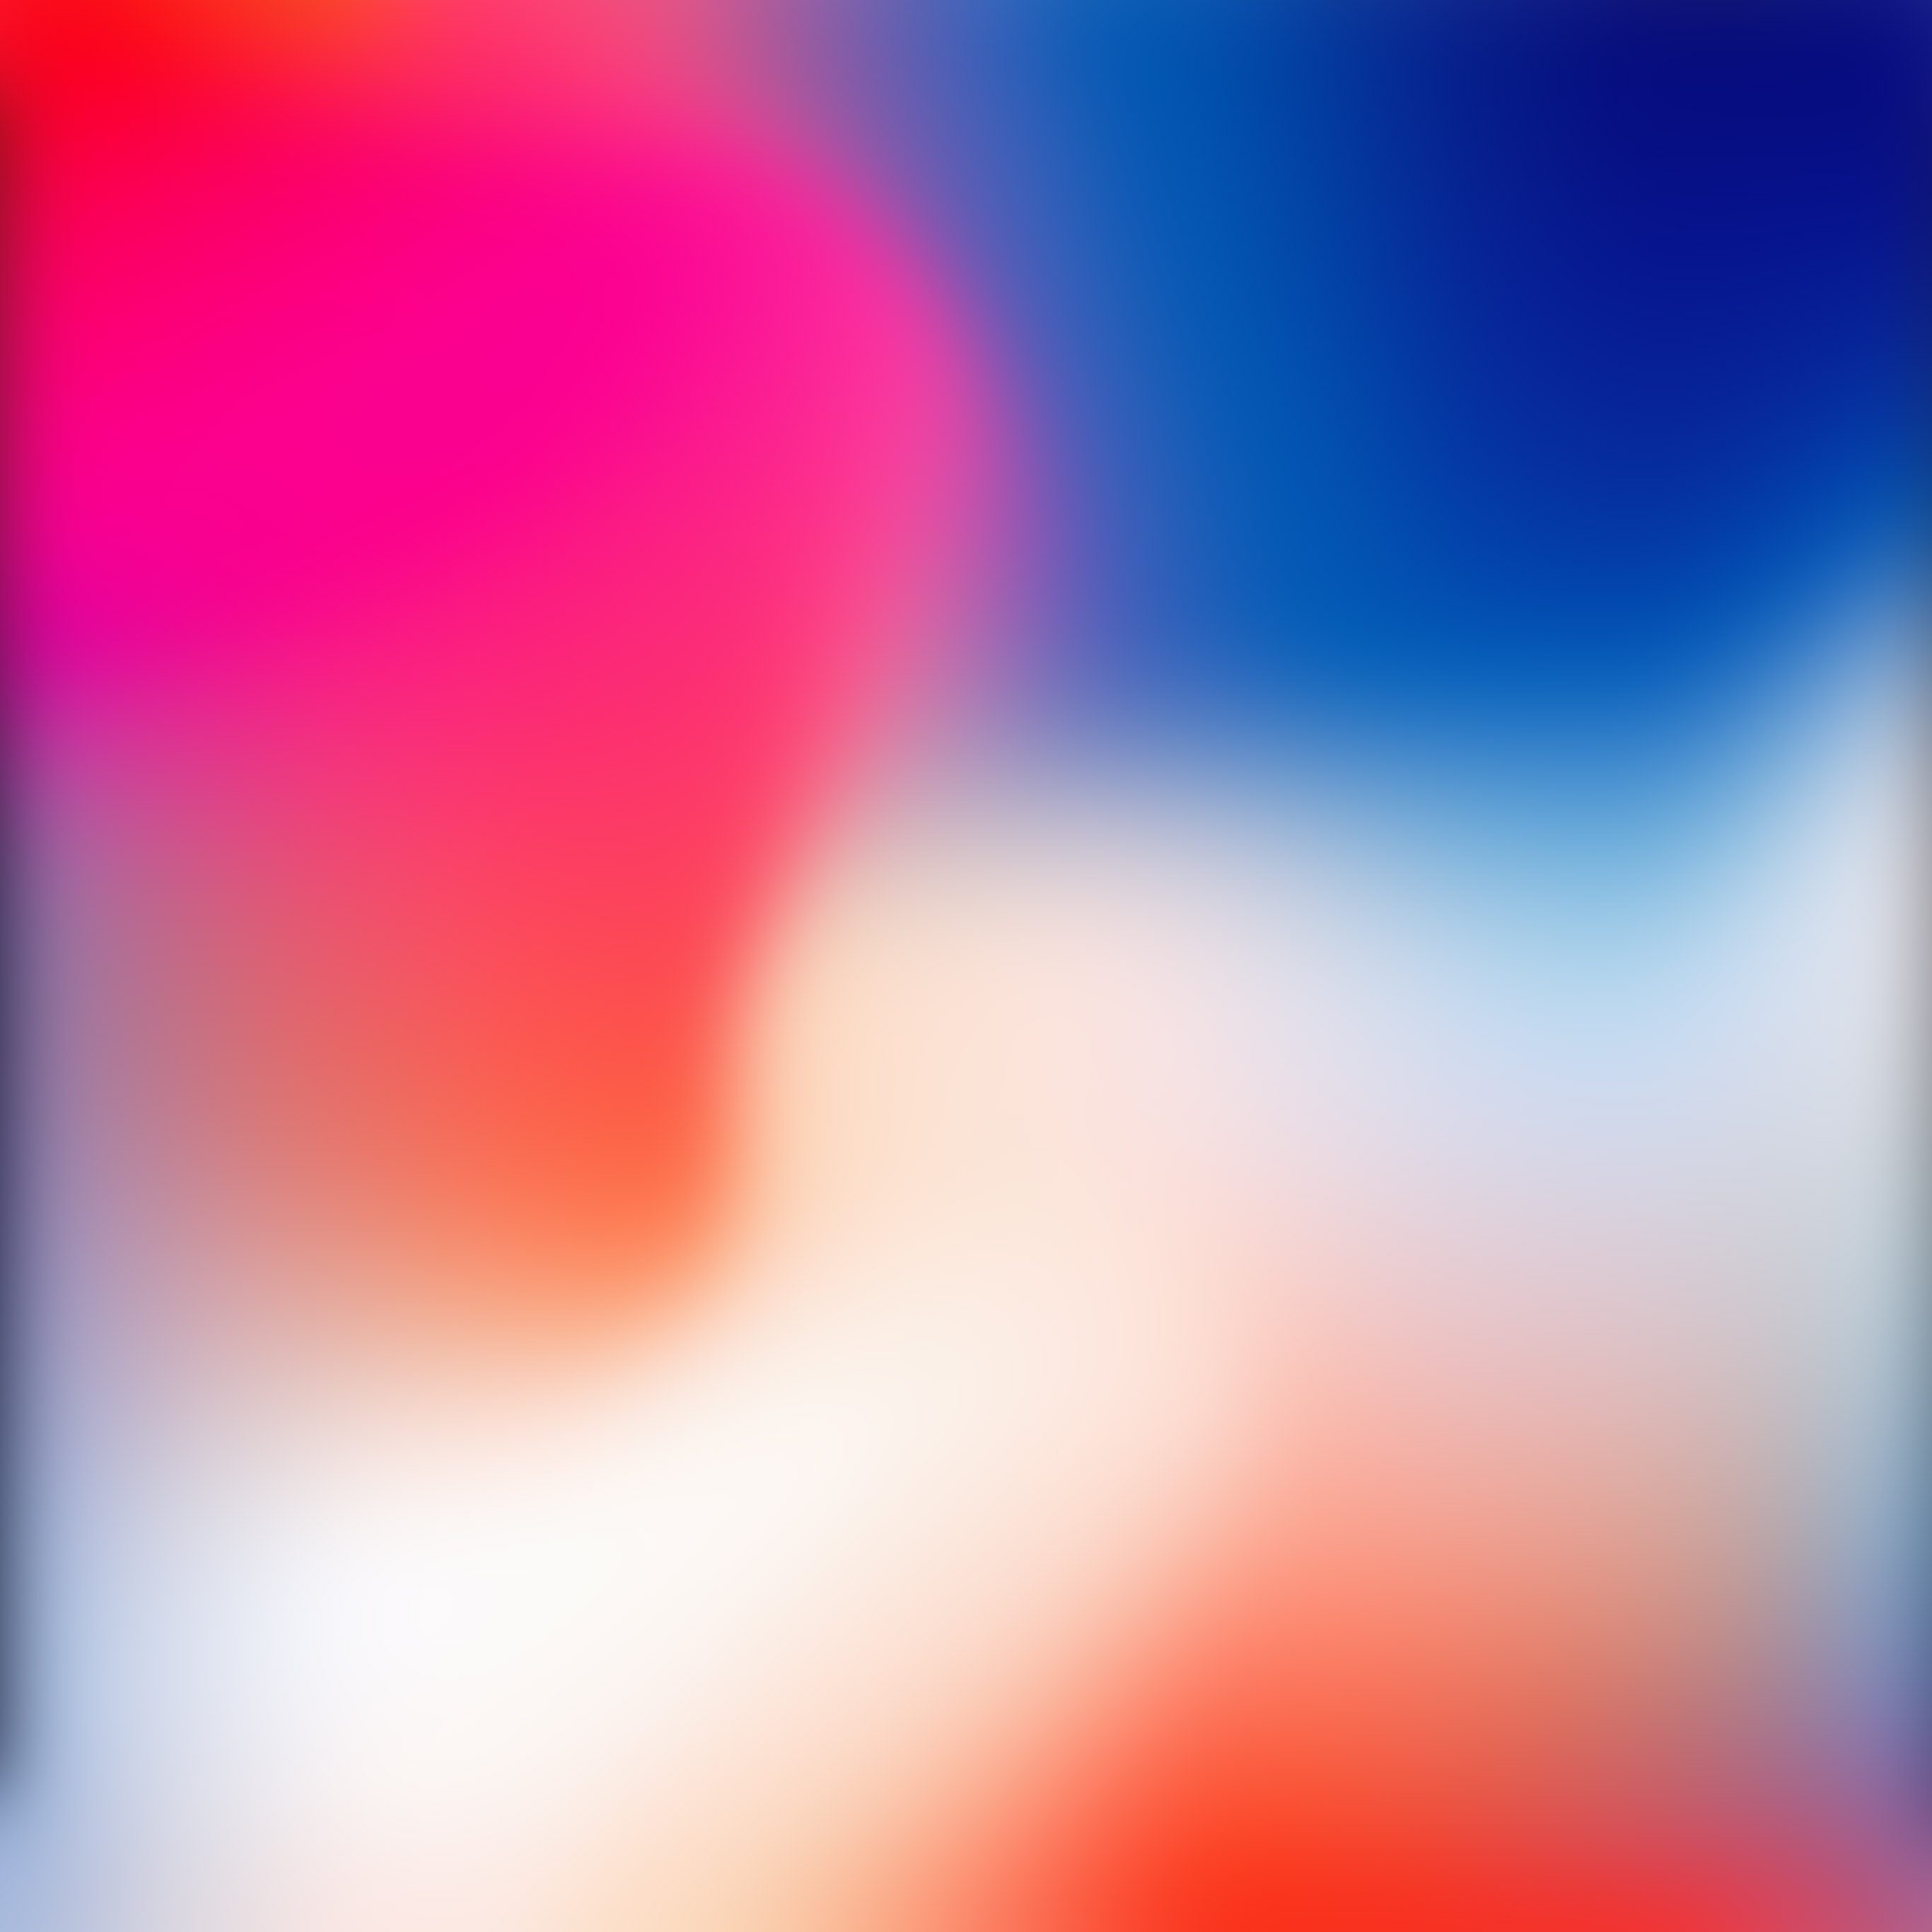 Sl90 Iphonex Apple Color Blur Gradation Wallpaper